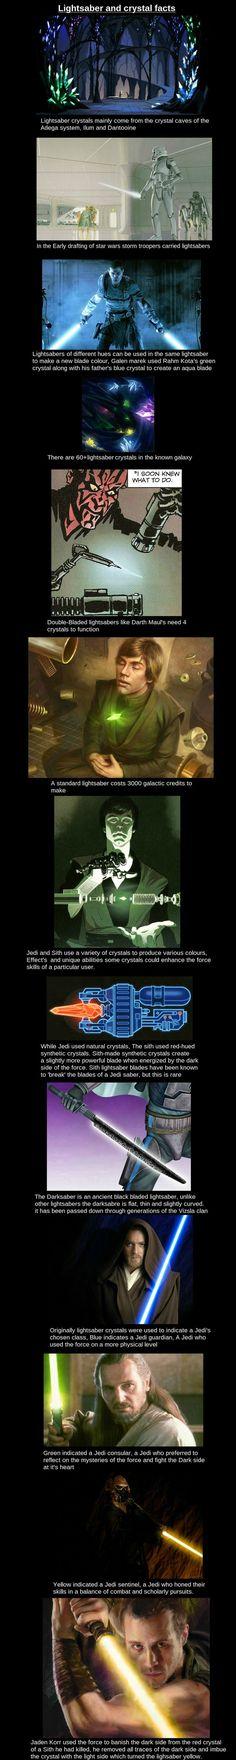 Lightsaber Crystals, geeky fandom facts